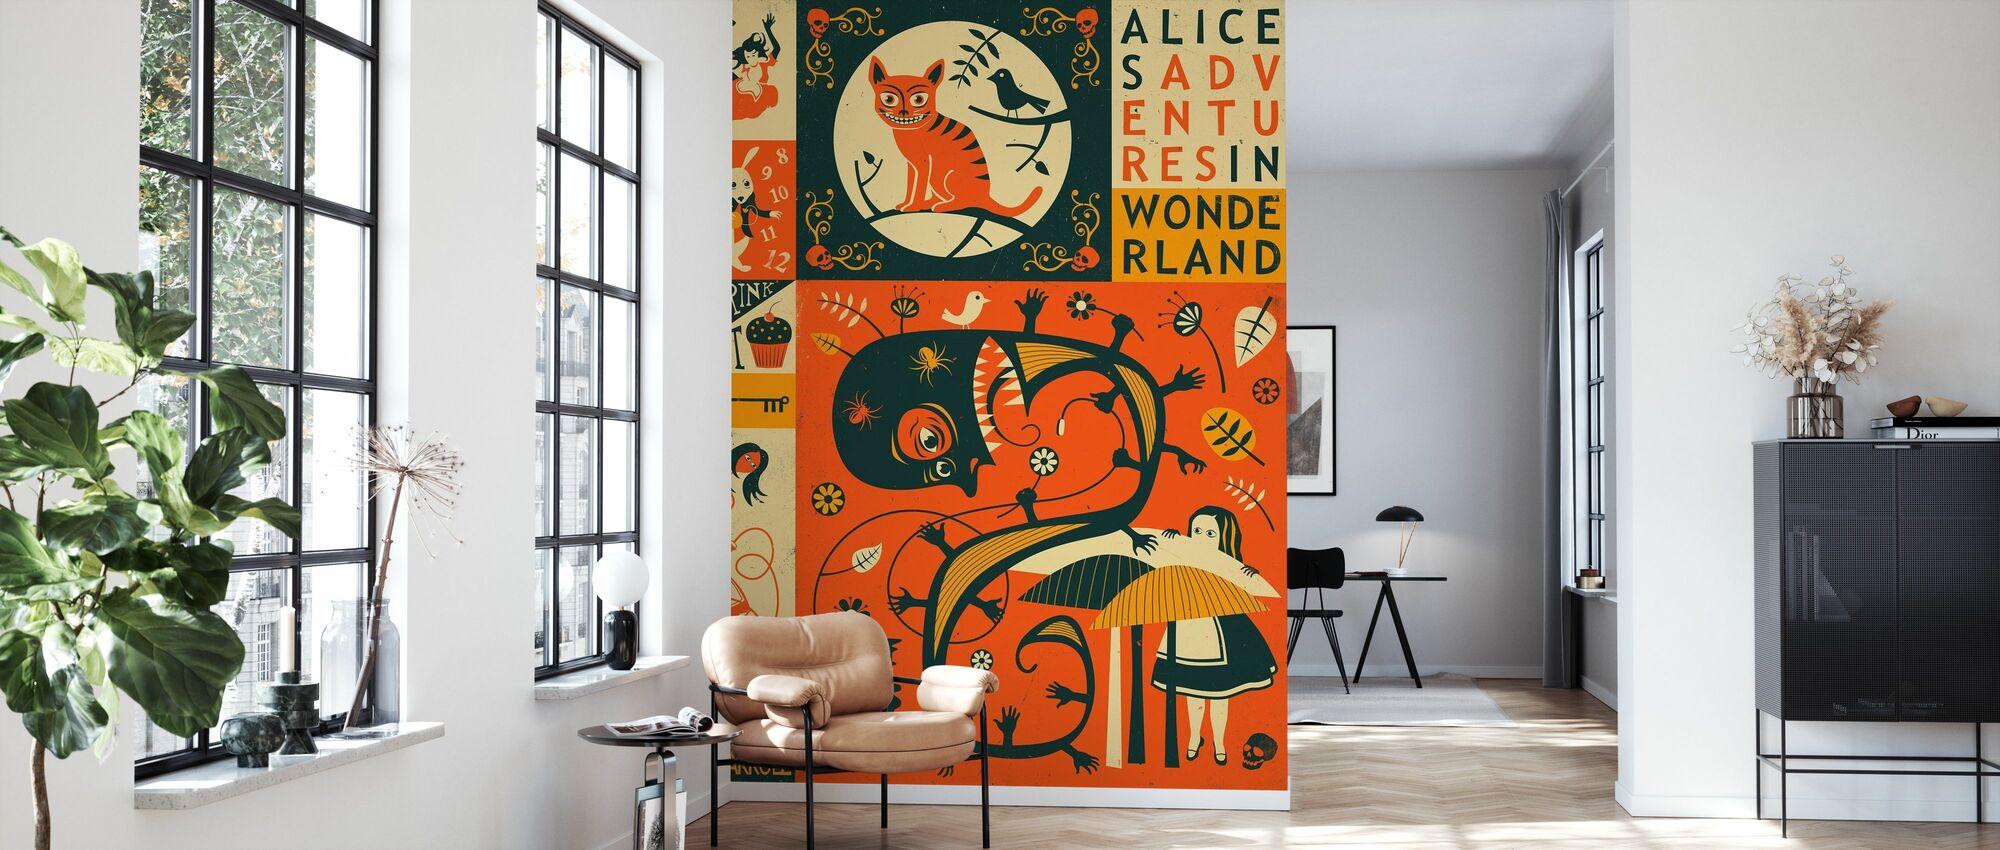 Alice in Wonderland - Wallpaper - Living Room